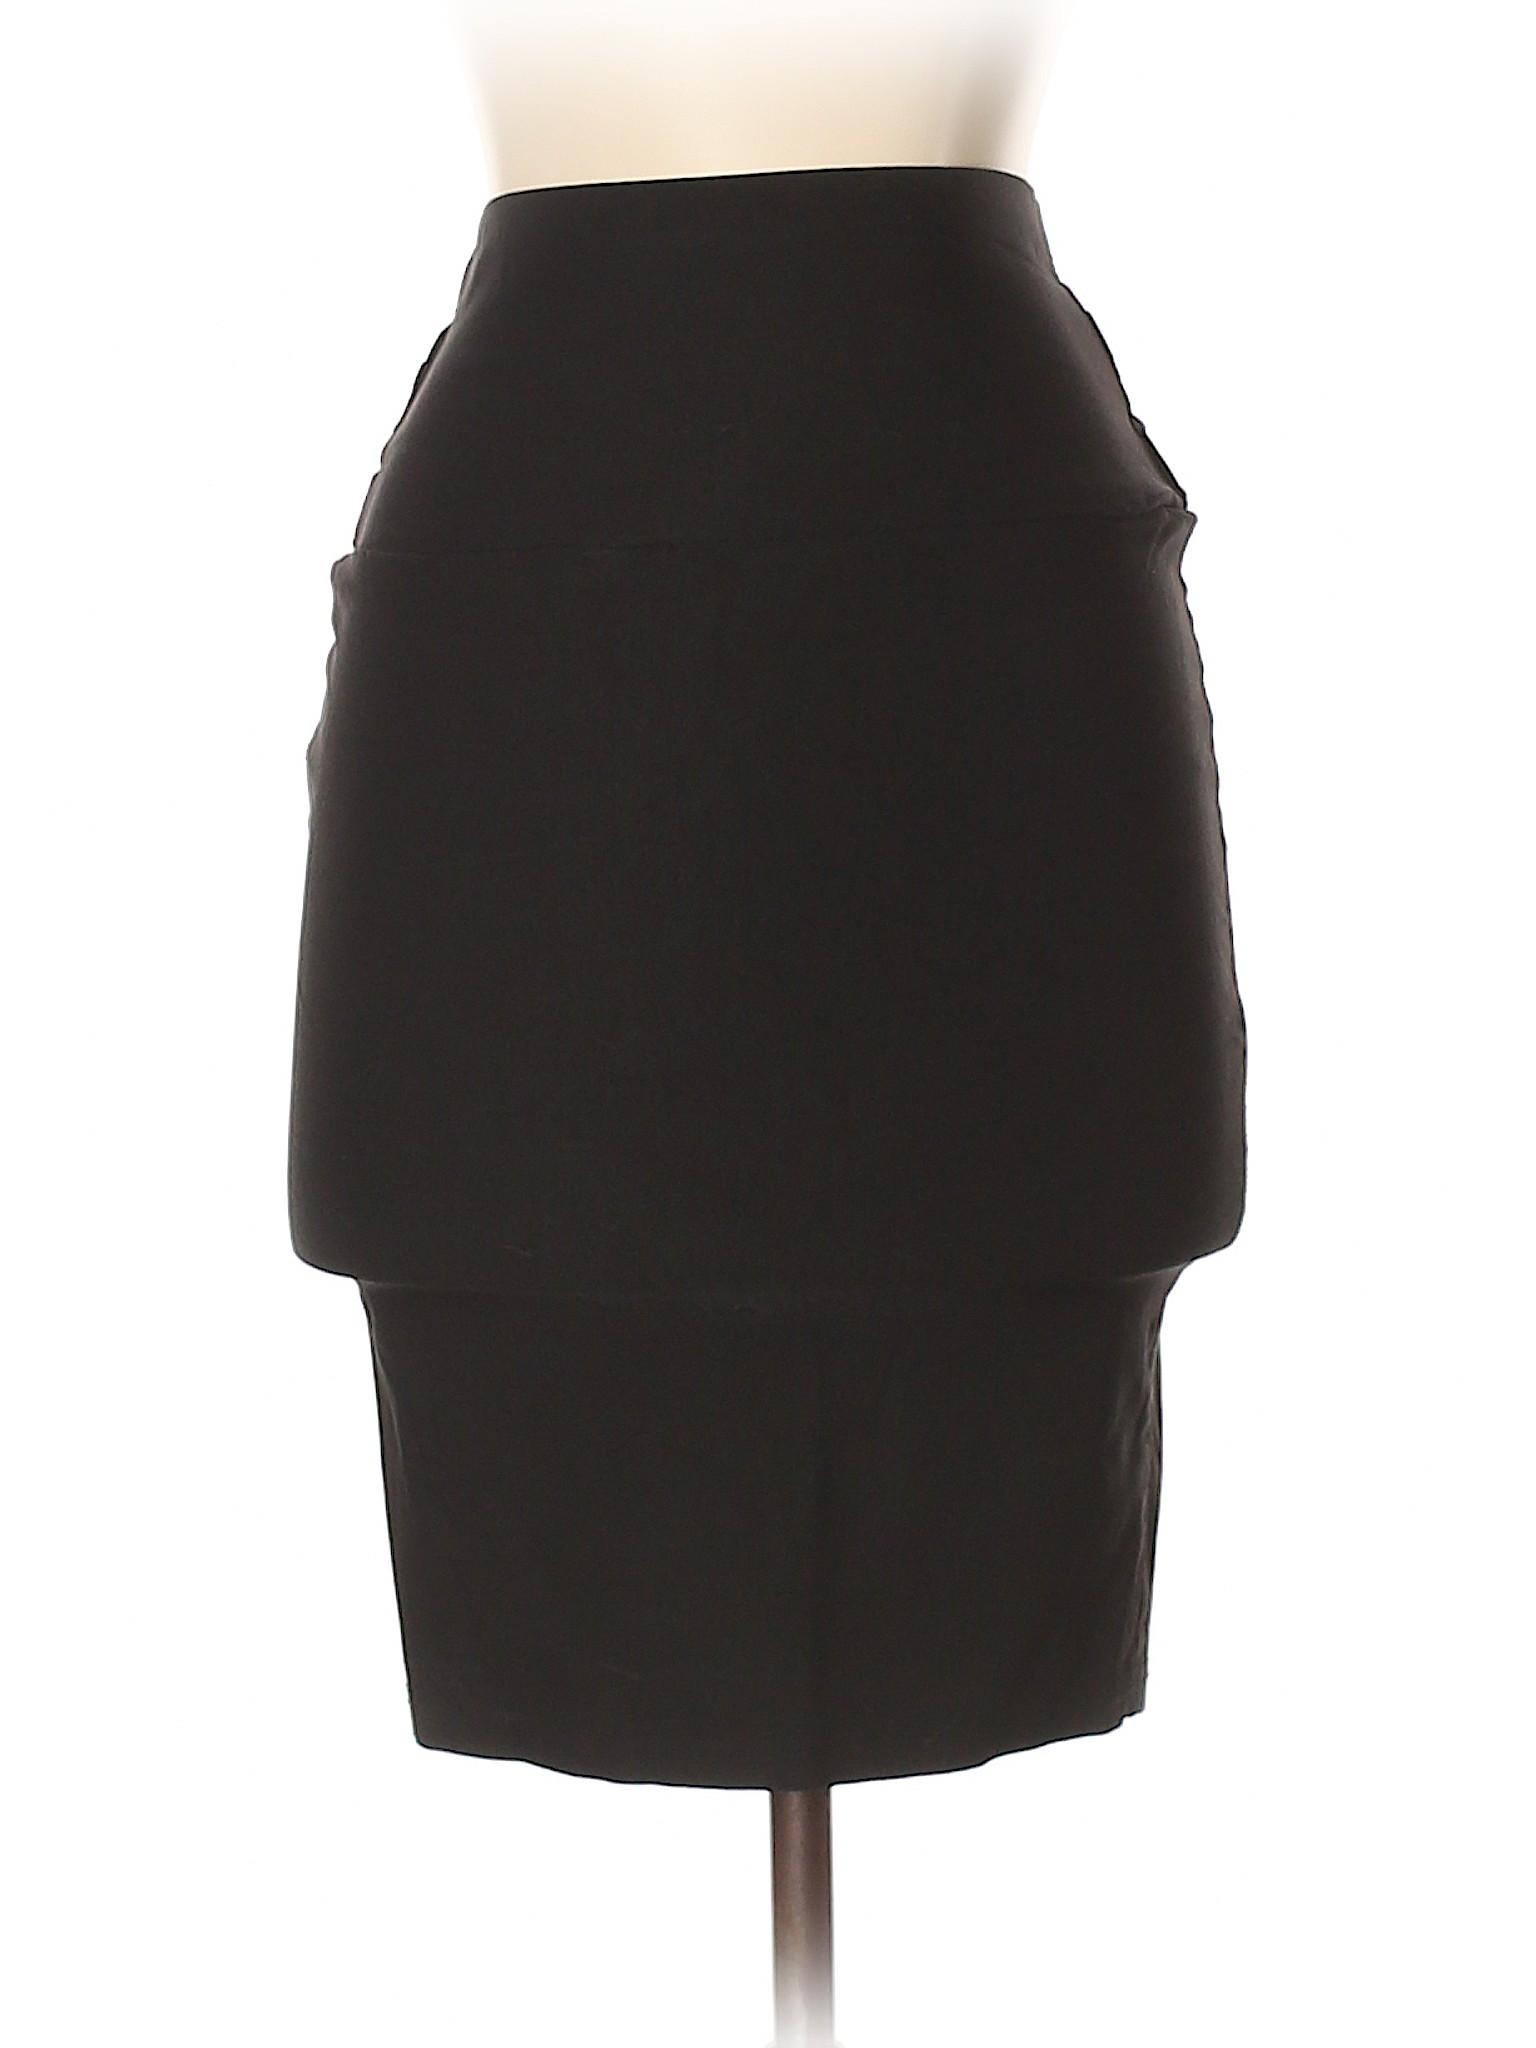 winter winter Valia Valia Skirt Casual winter Leisure Valia Leisure Leisure Casual Skirt Skirt Casual Leisure qwxPAH4C